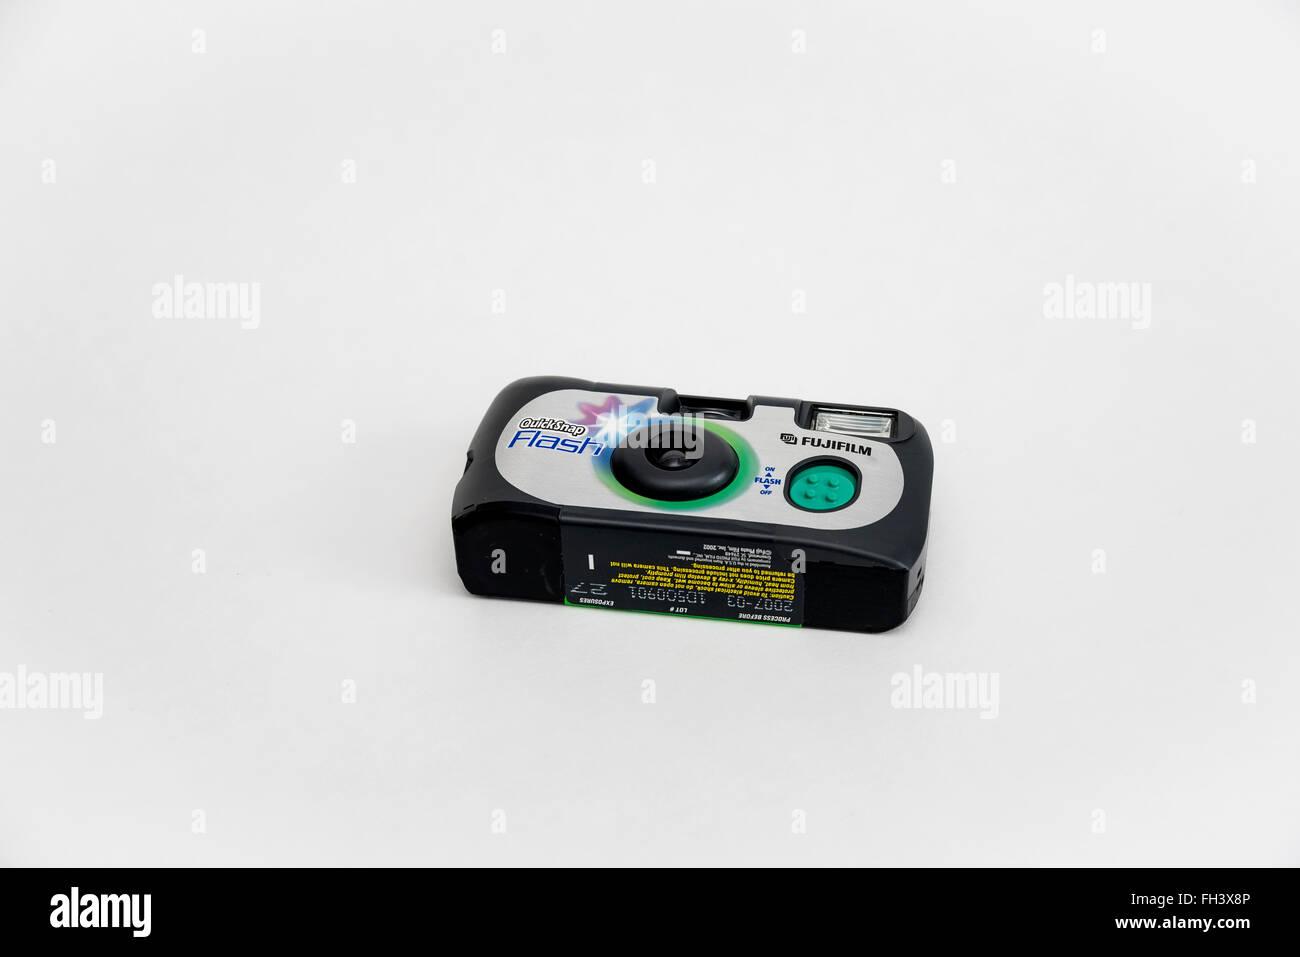 Disposable film camera Fuji - Stock Image